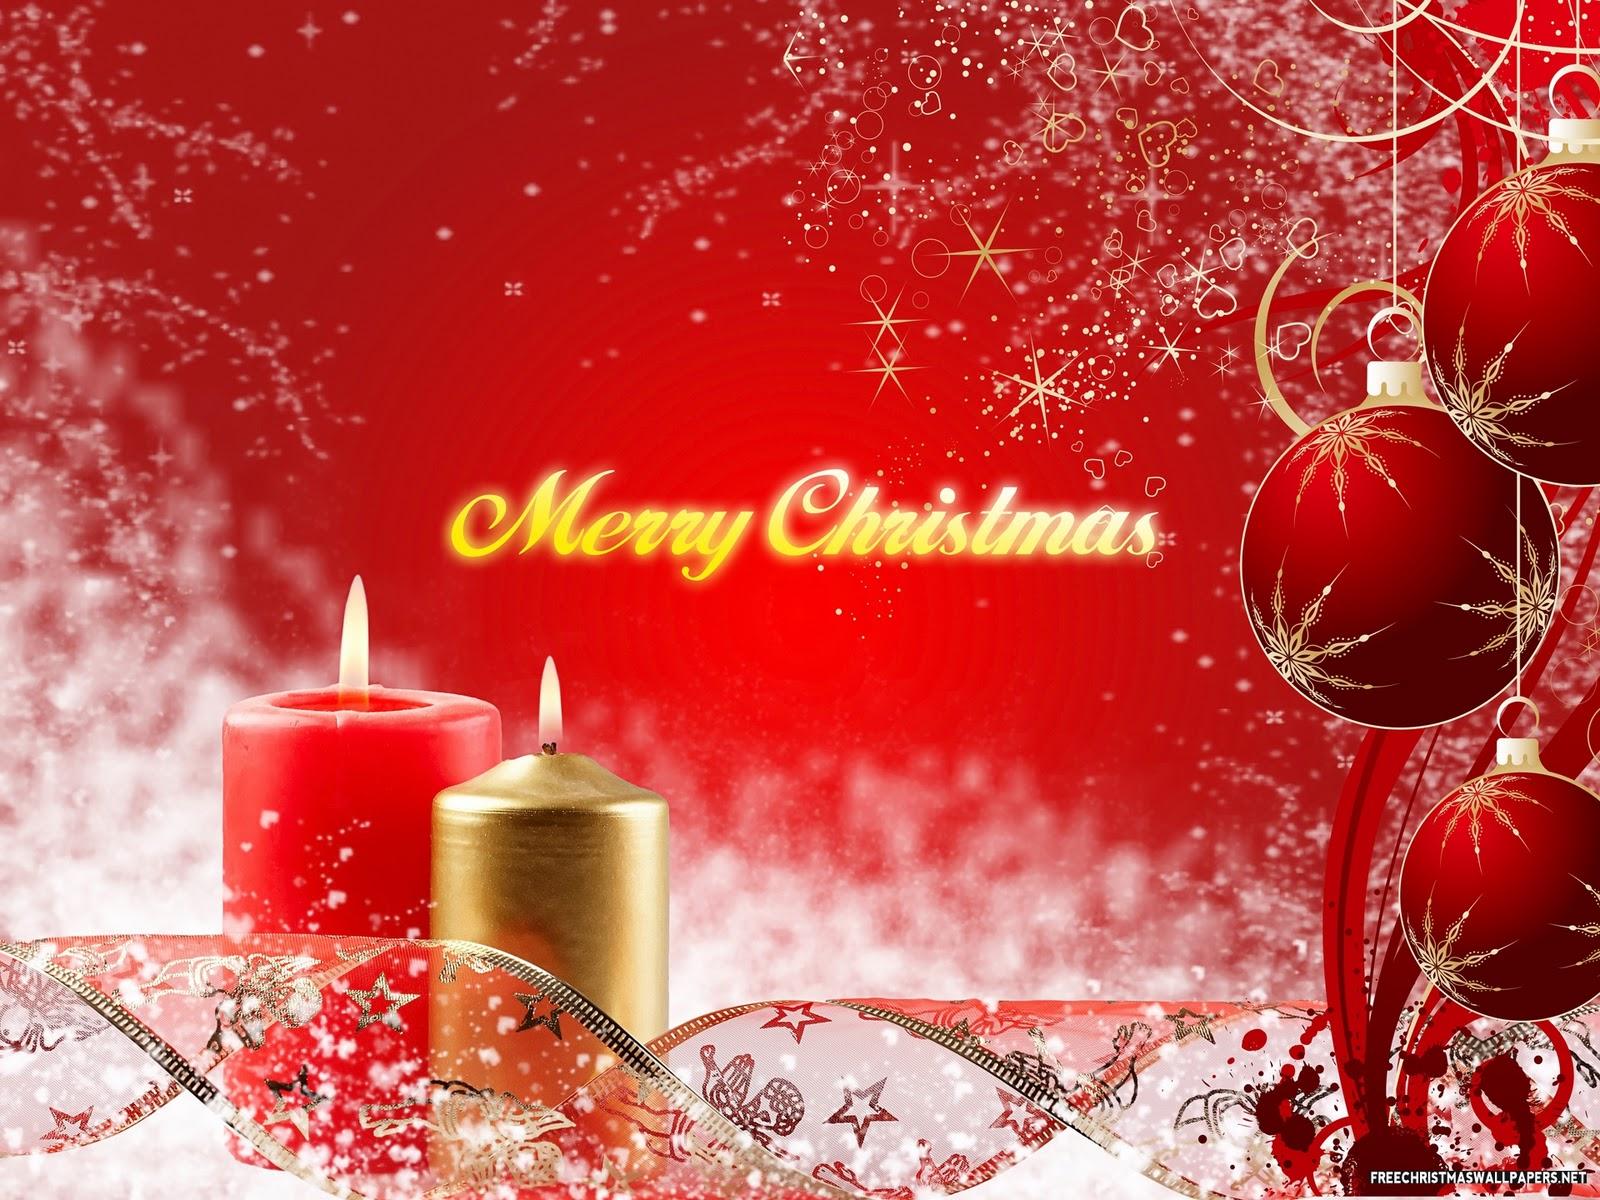 http://3.bp.blogspot.com/-nIgzxDsldV0/TvQdyUBb-VI/AAAAAAAABwA/JXkU-3Om7C4/s1600/Merry-Christmas-Candles-218077.jpeg